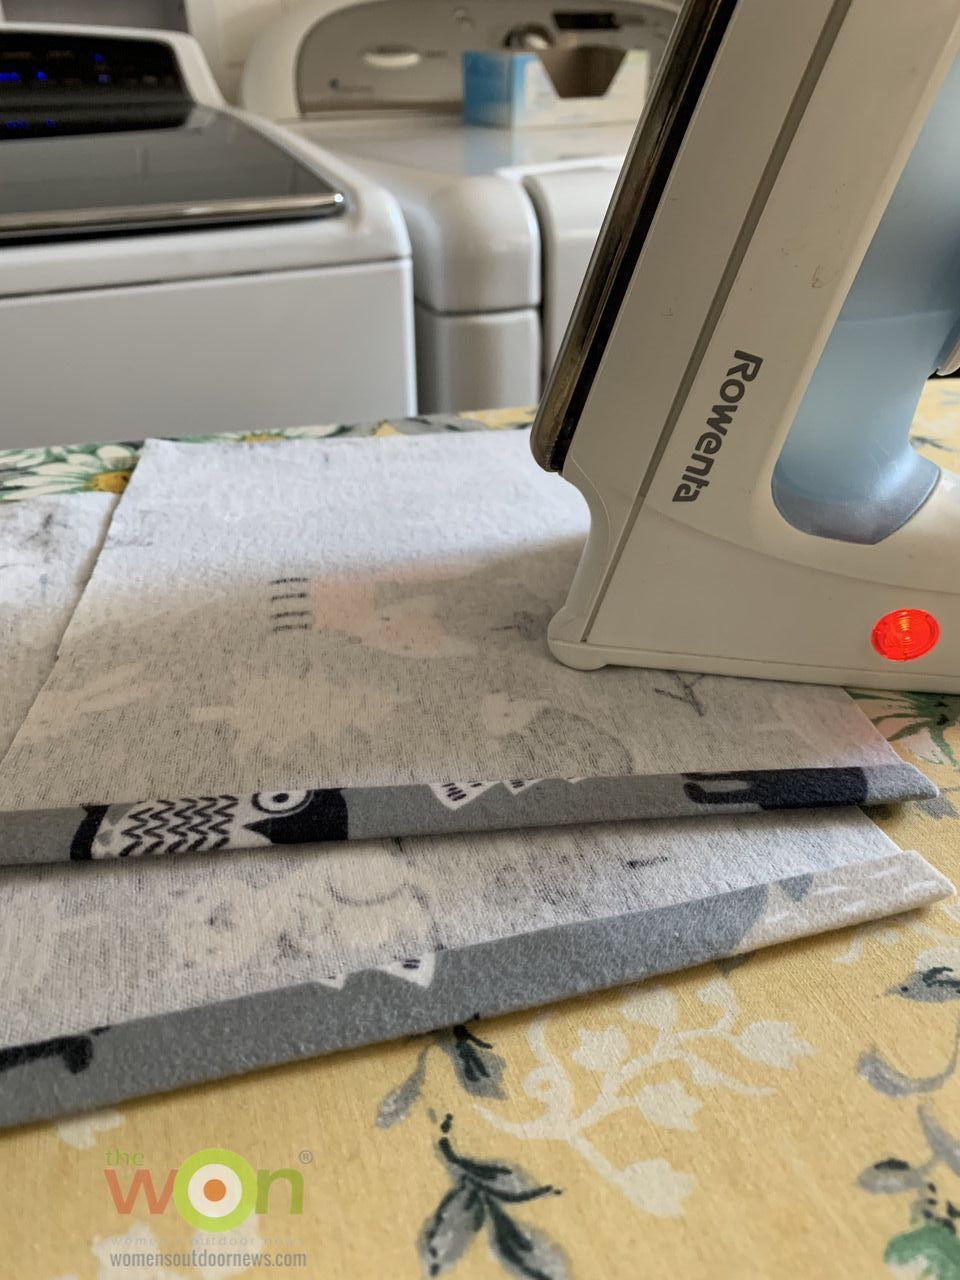 ironing hems flax bags